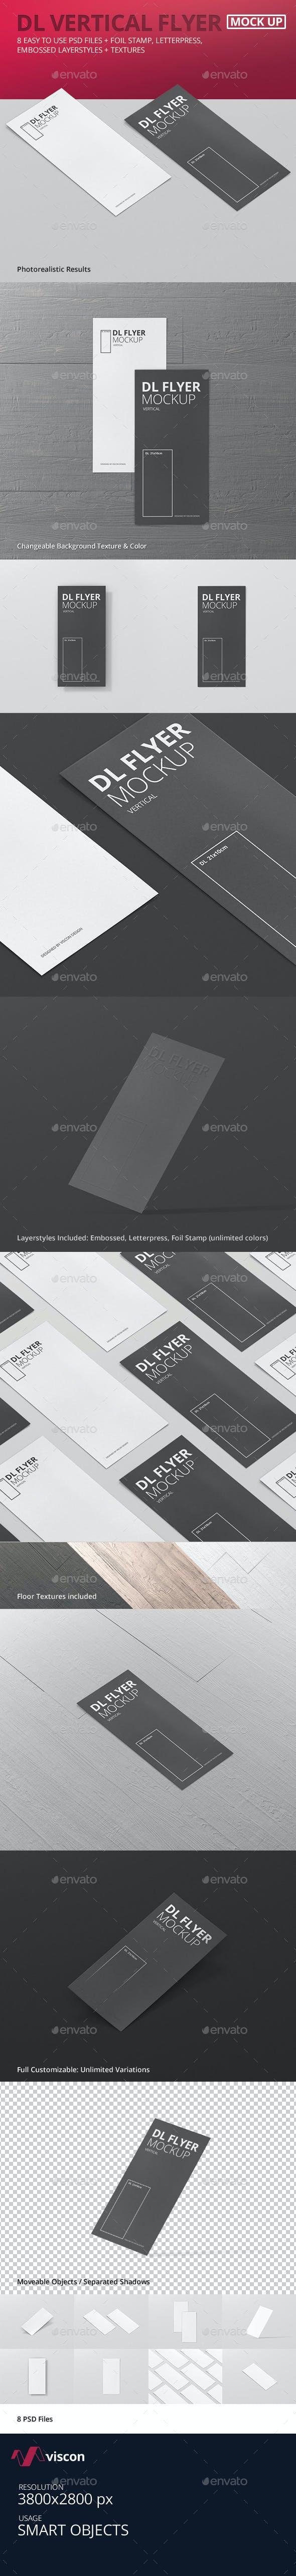 dl vertical flyer mockup by visconbiz graphicriver